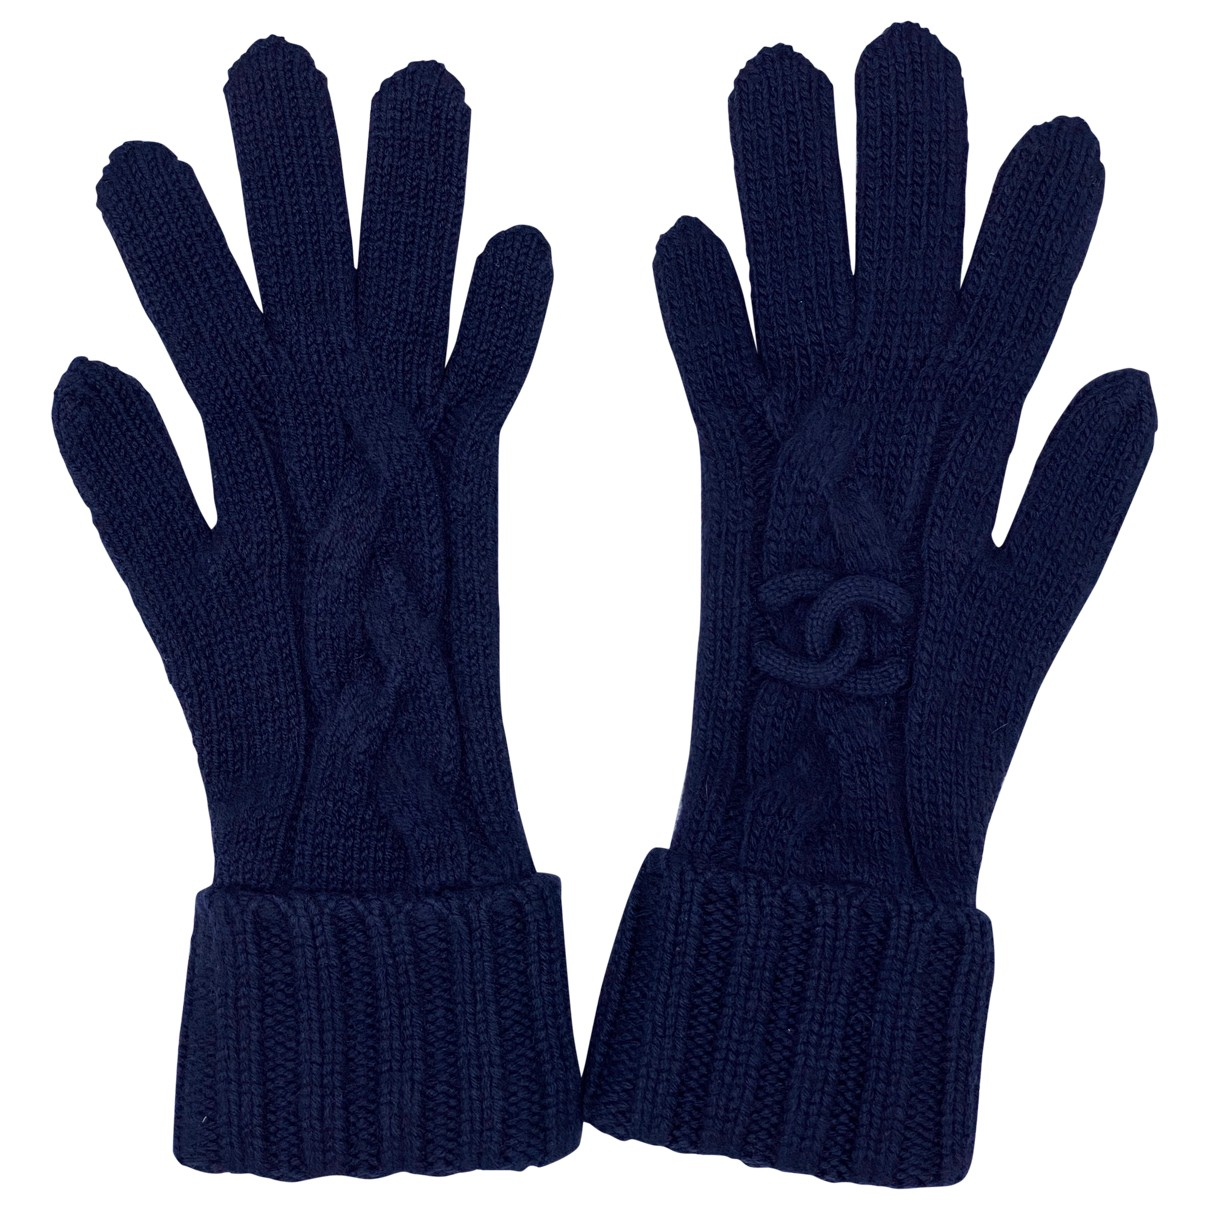 Chanel \N Navy Cashmere Gloves for Women M International